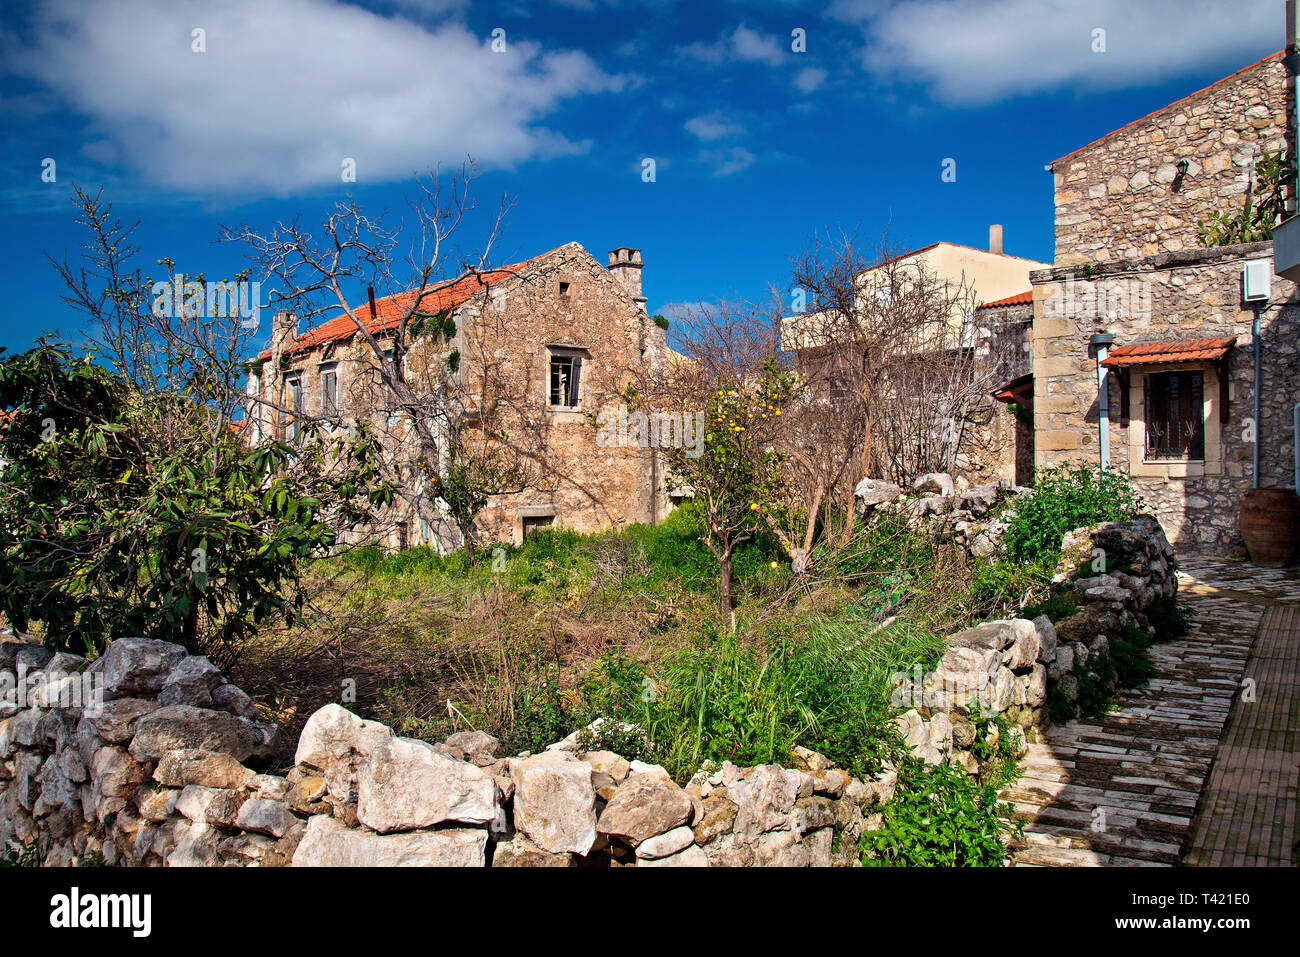 Picturesque corner at Margarites village, Mylopotamos county, Rethymno, Crete, Greece. Margarites village is famous for its ceramics art workshops. - Stock Image